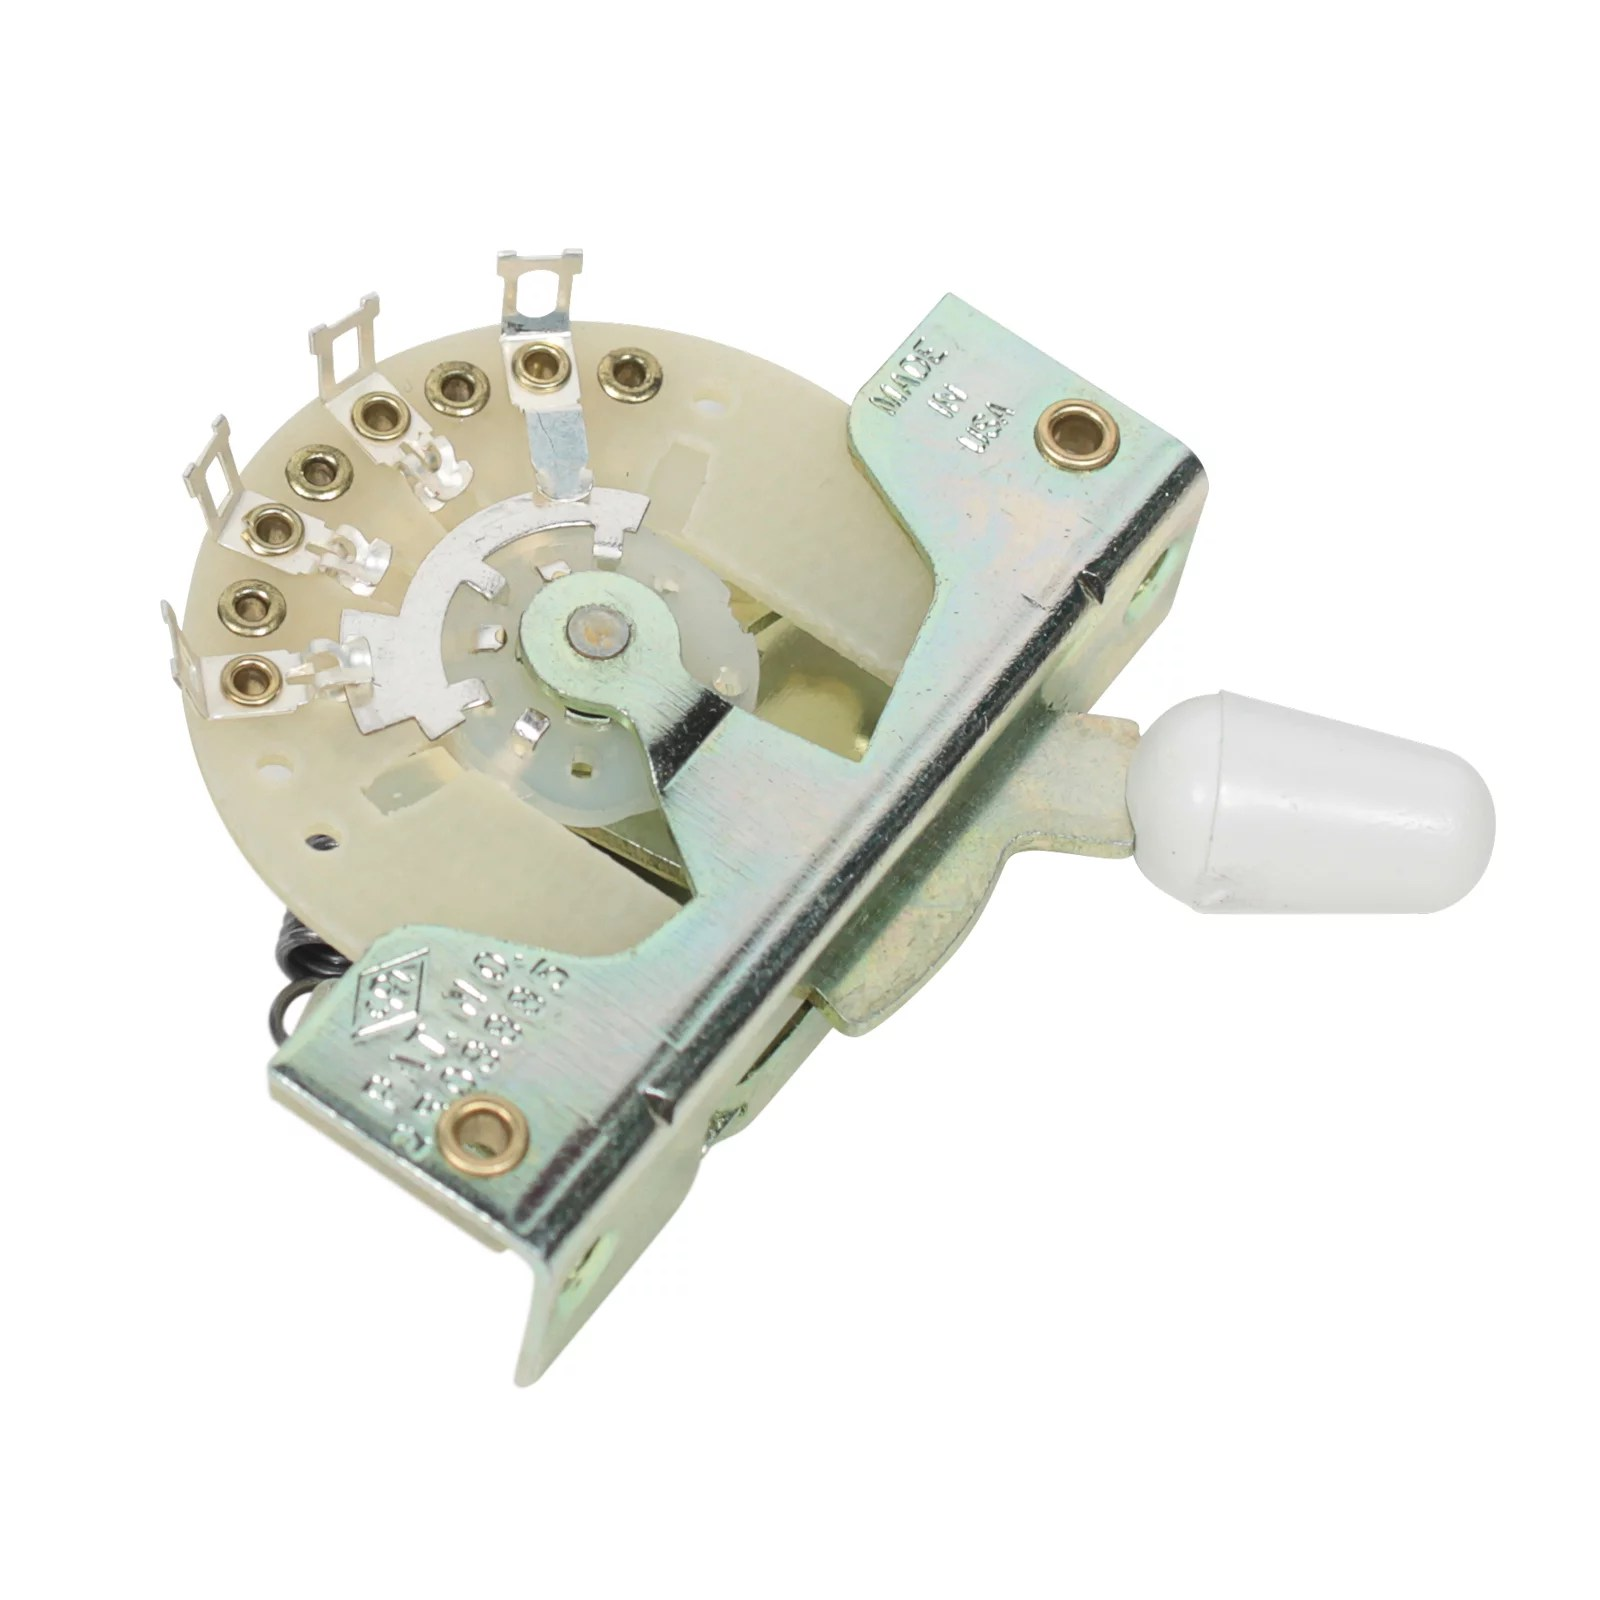 fender stratocaster guitar 5 way wiring kit crl switch cts pots fender stratocaster guitar 5way wiring kit crl switch cts pots [ 1600 x 1600 Pixel ]